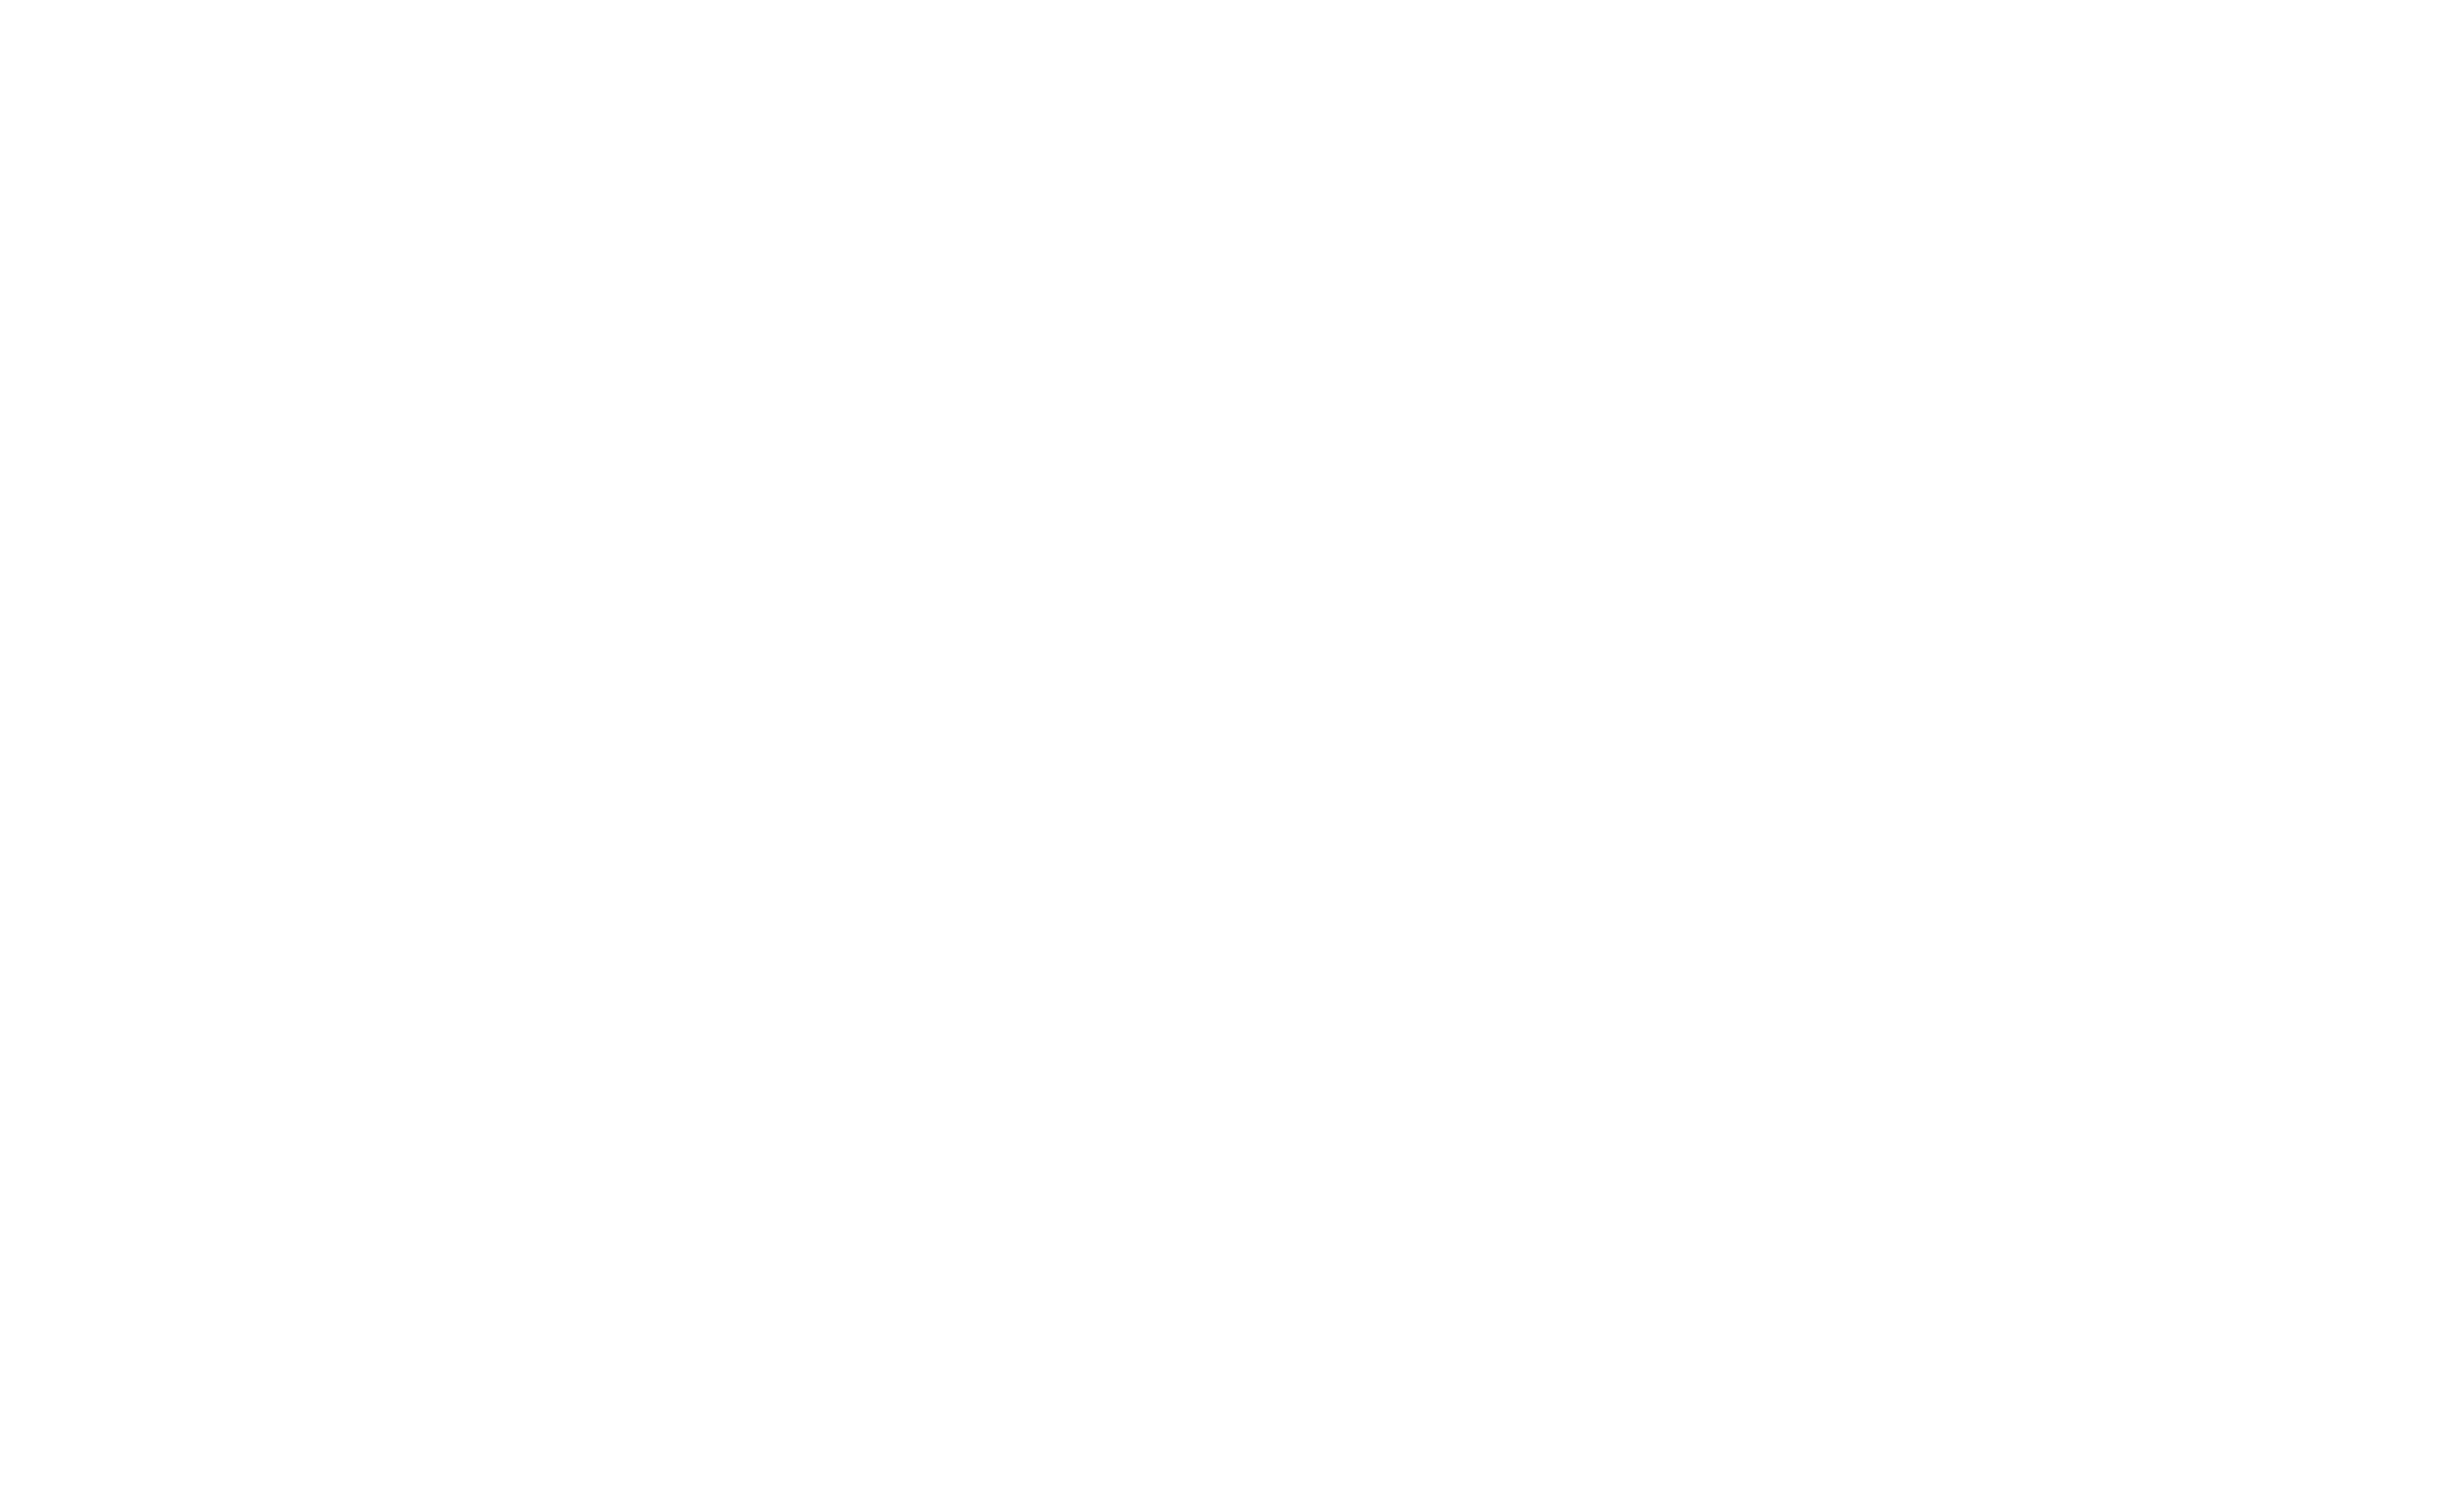 Eclipse_Acupuncture_Logo-White